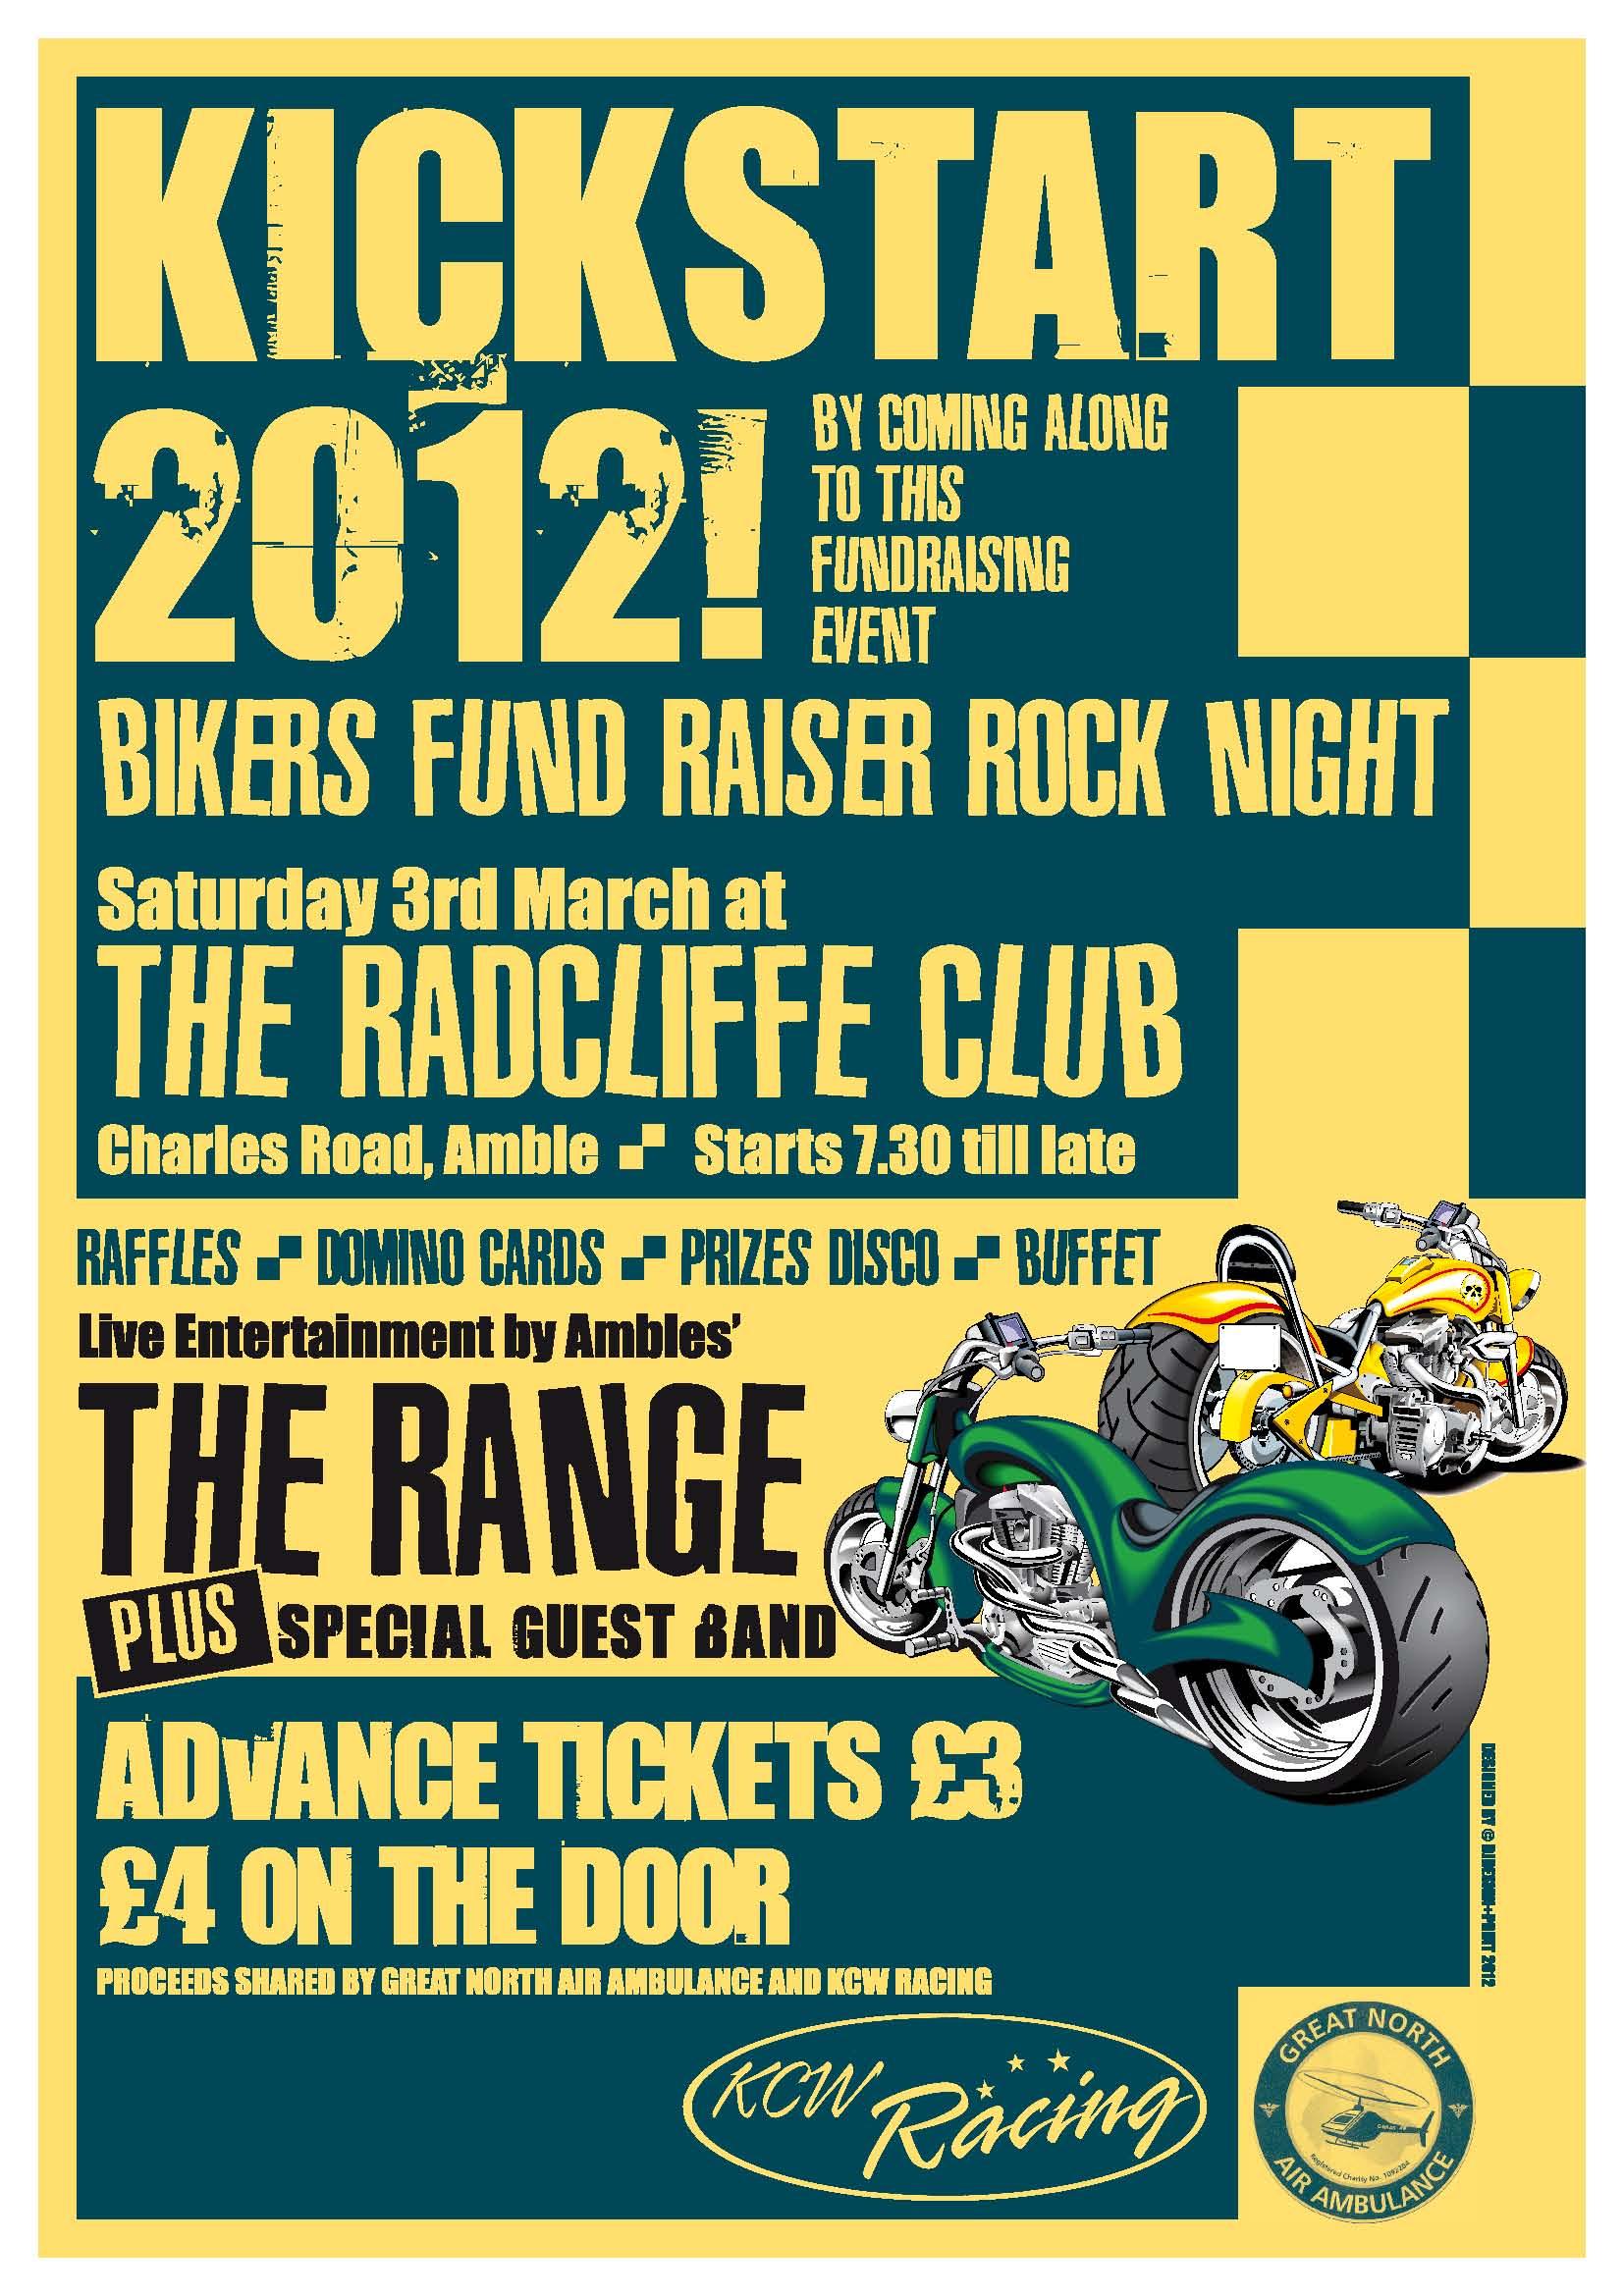 Biker Fundraising Rock Night